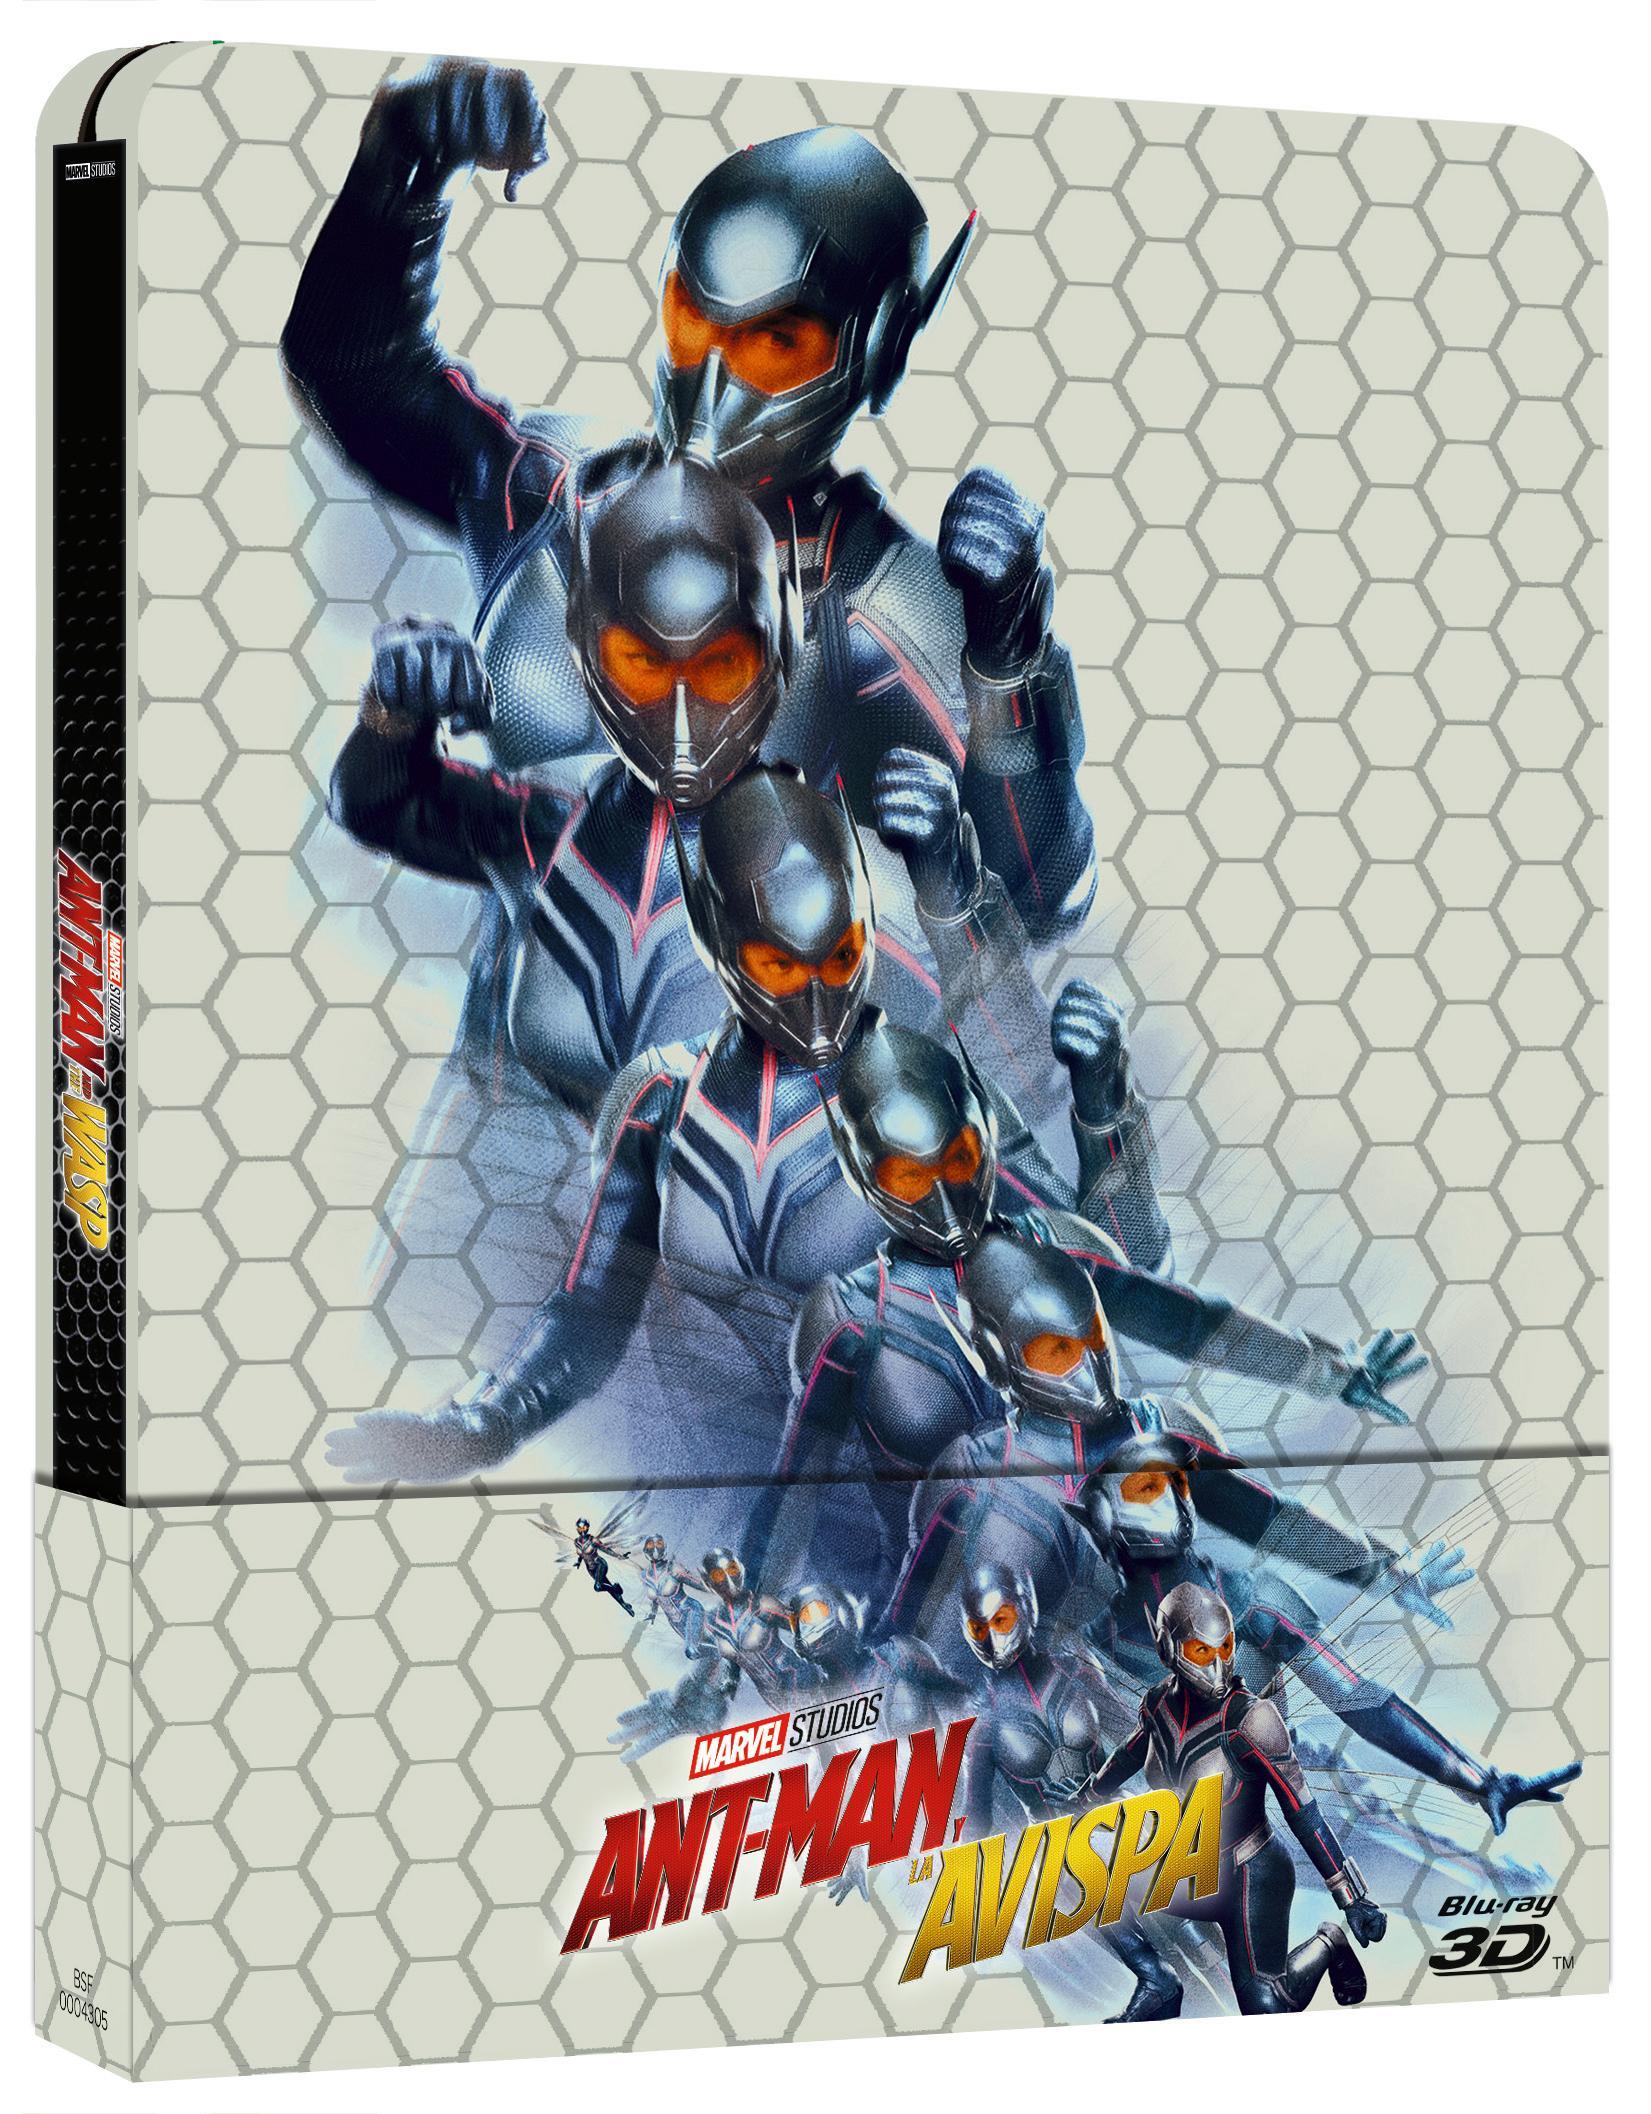 Ant-Man y la Avispa Steelbook 3D Blu-ray